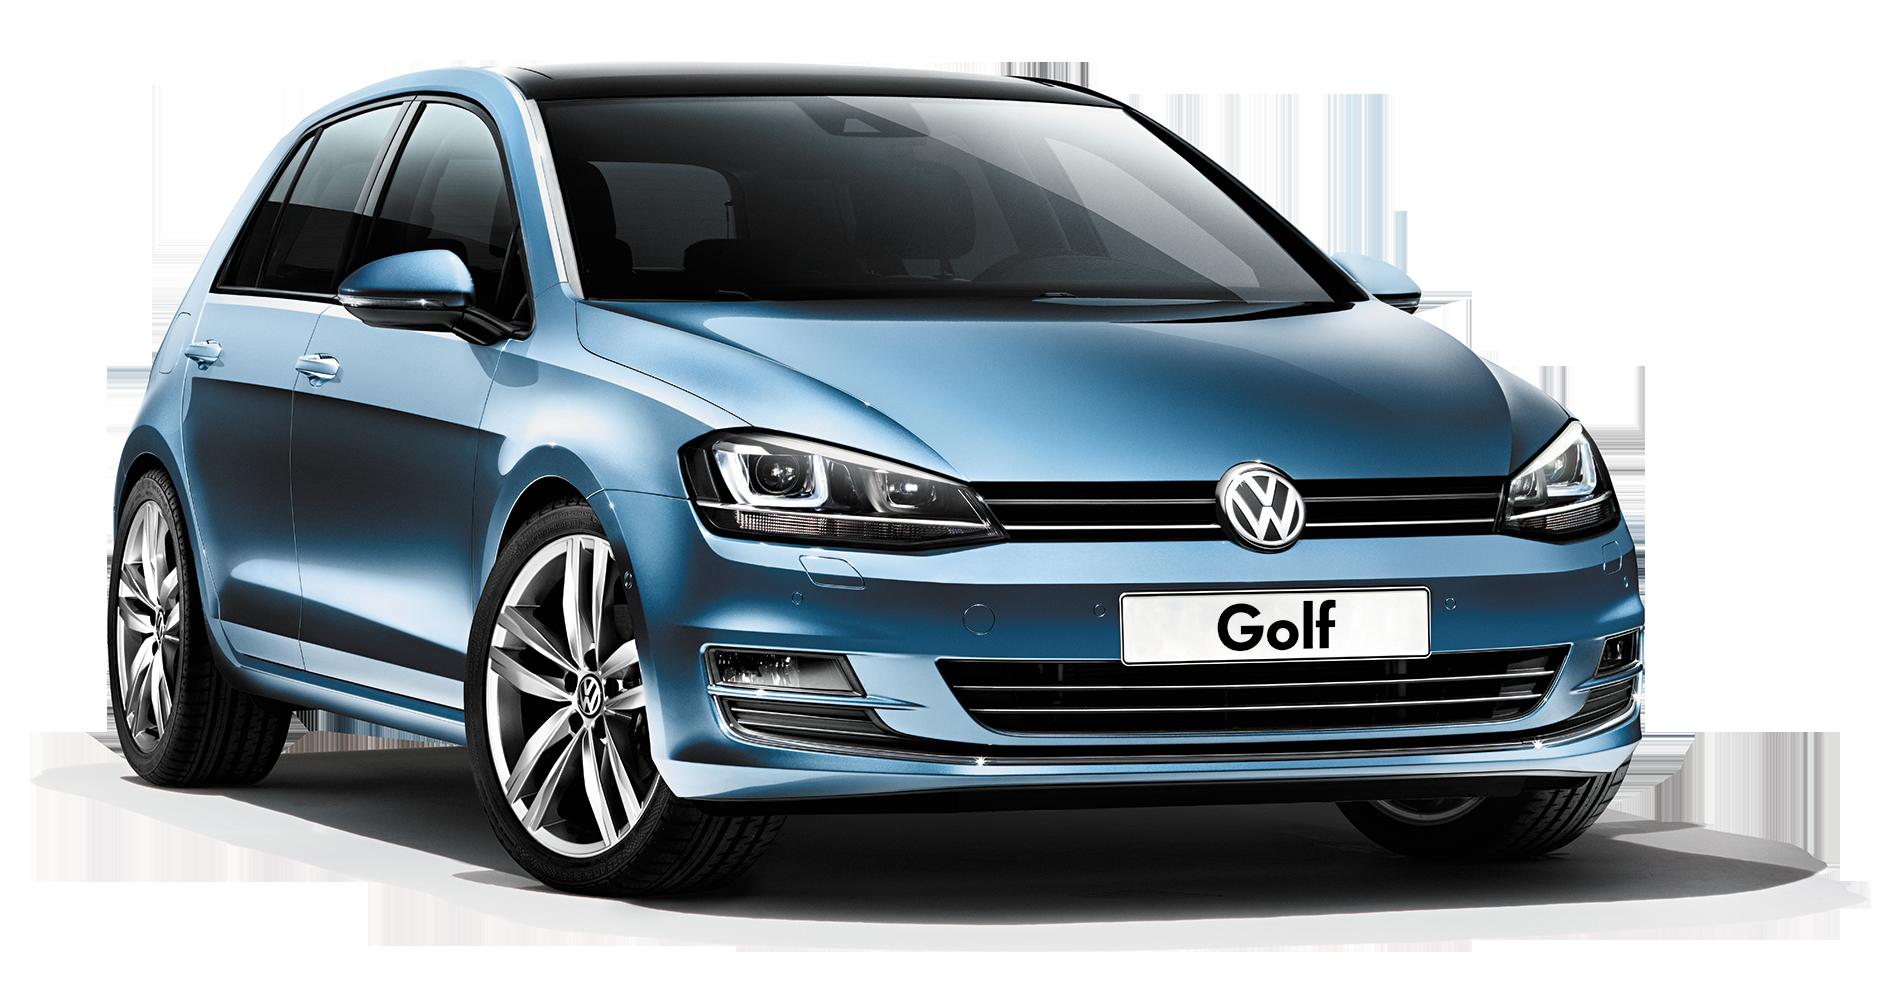 blue Volkswagen Golf PNG car image - Volkswagen PNG